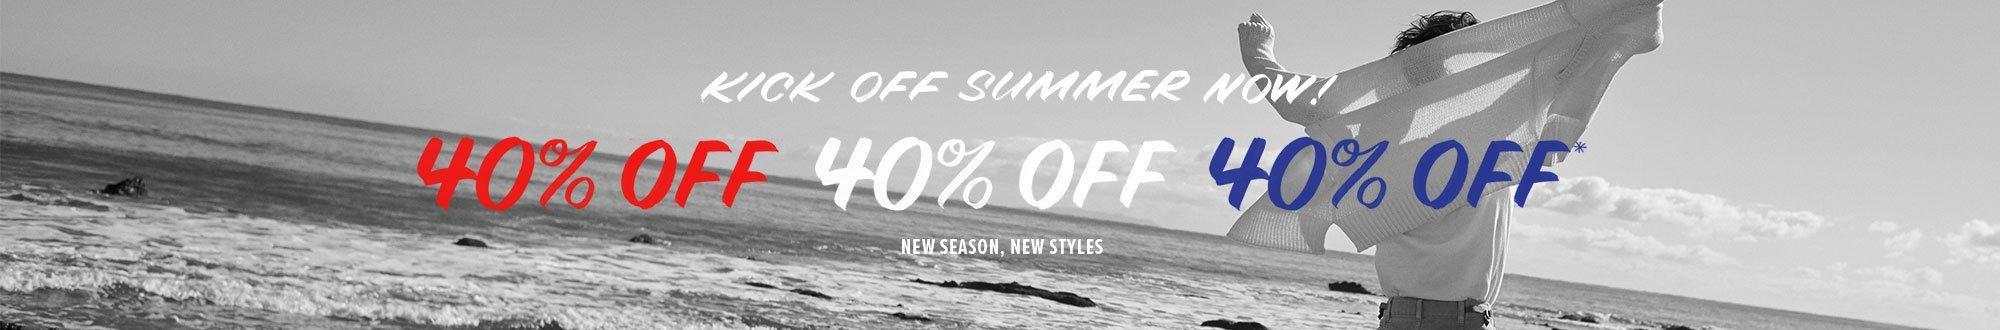 40% Off, New Season New Styles